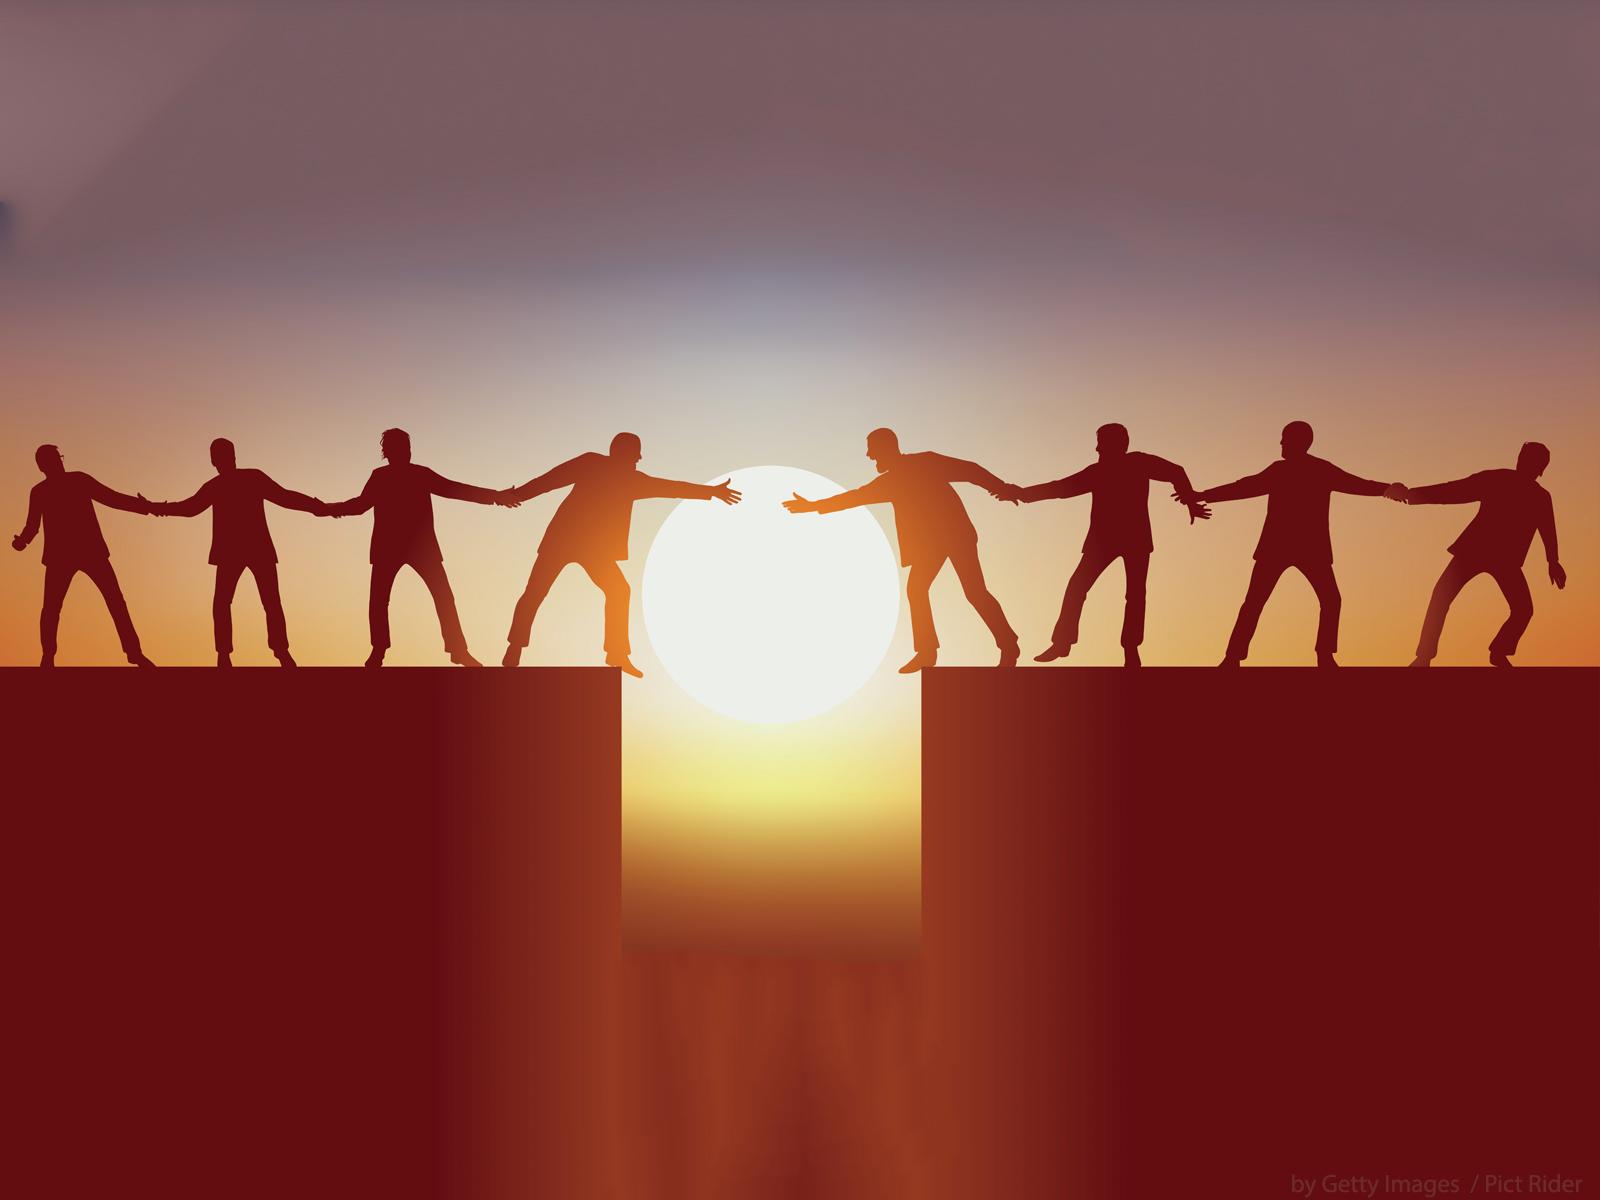 A sociedade precisa agir com princípios e valores